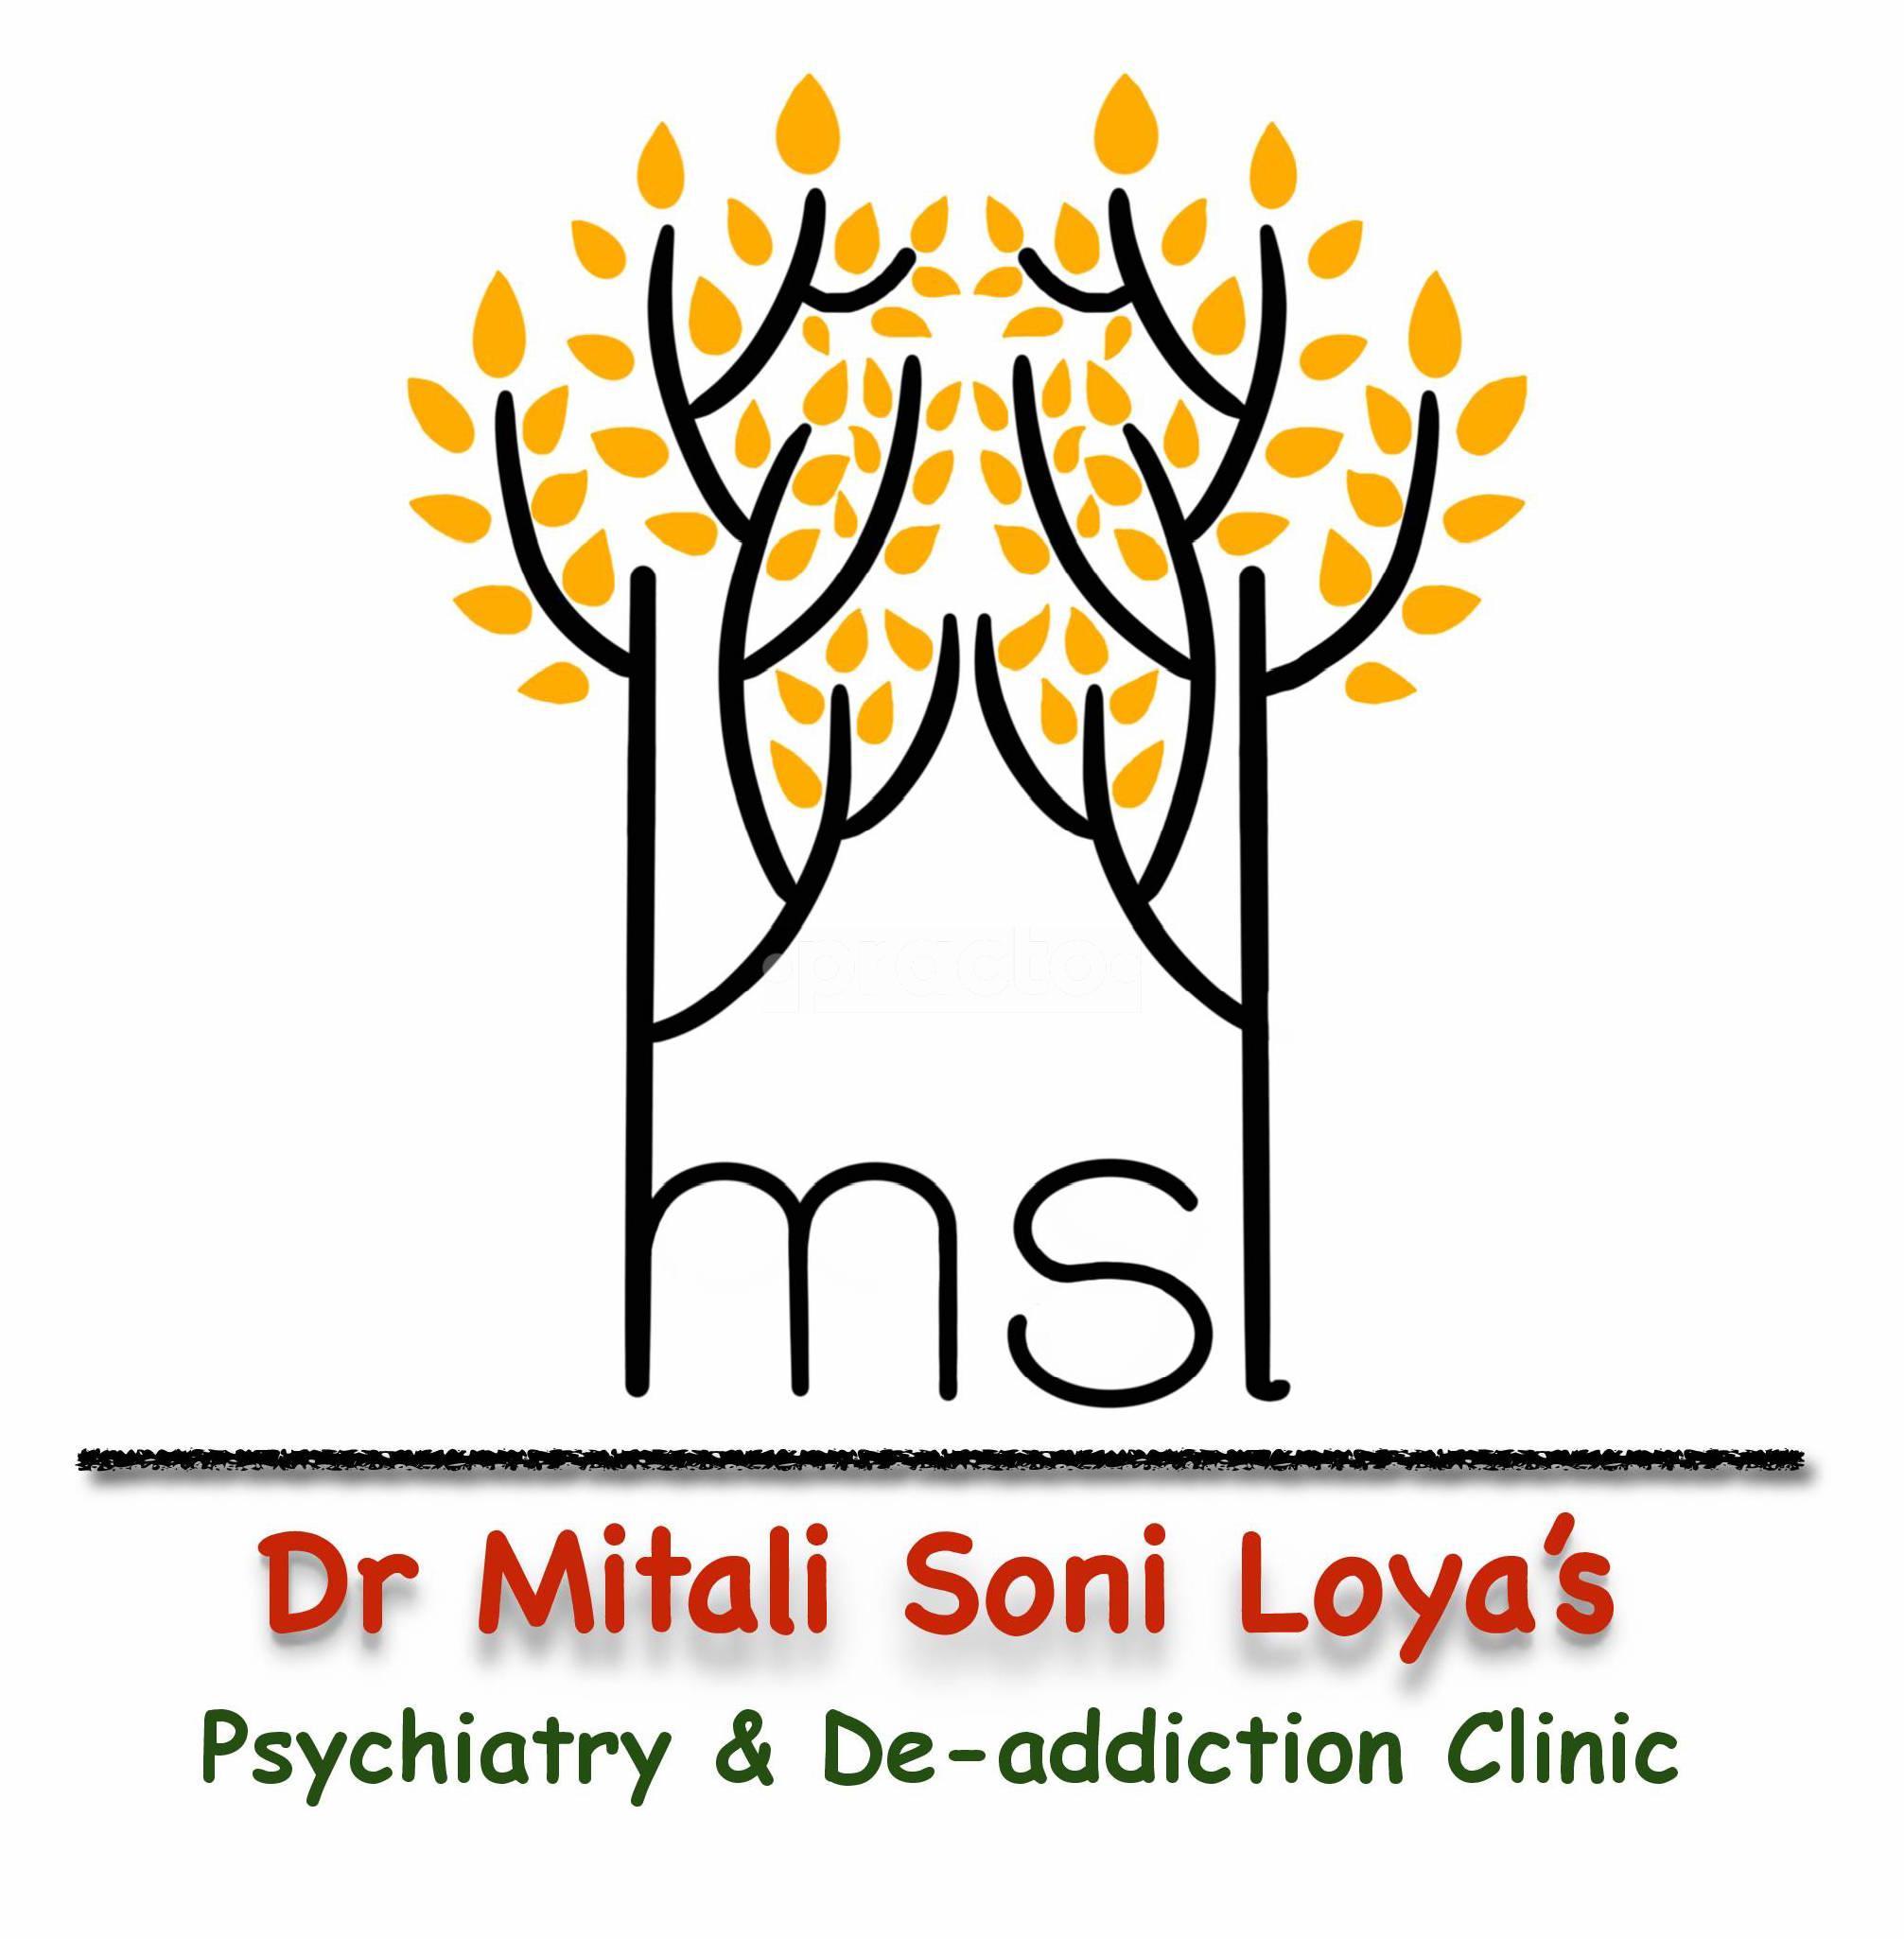 Dr Mitali Soni Loya's Psychiatry and De-Addiction Clinic